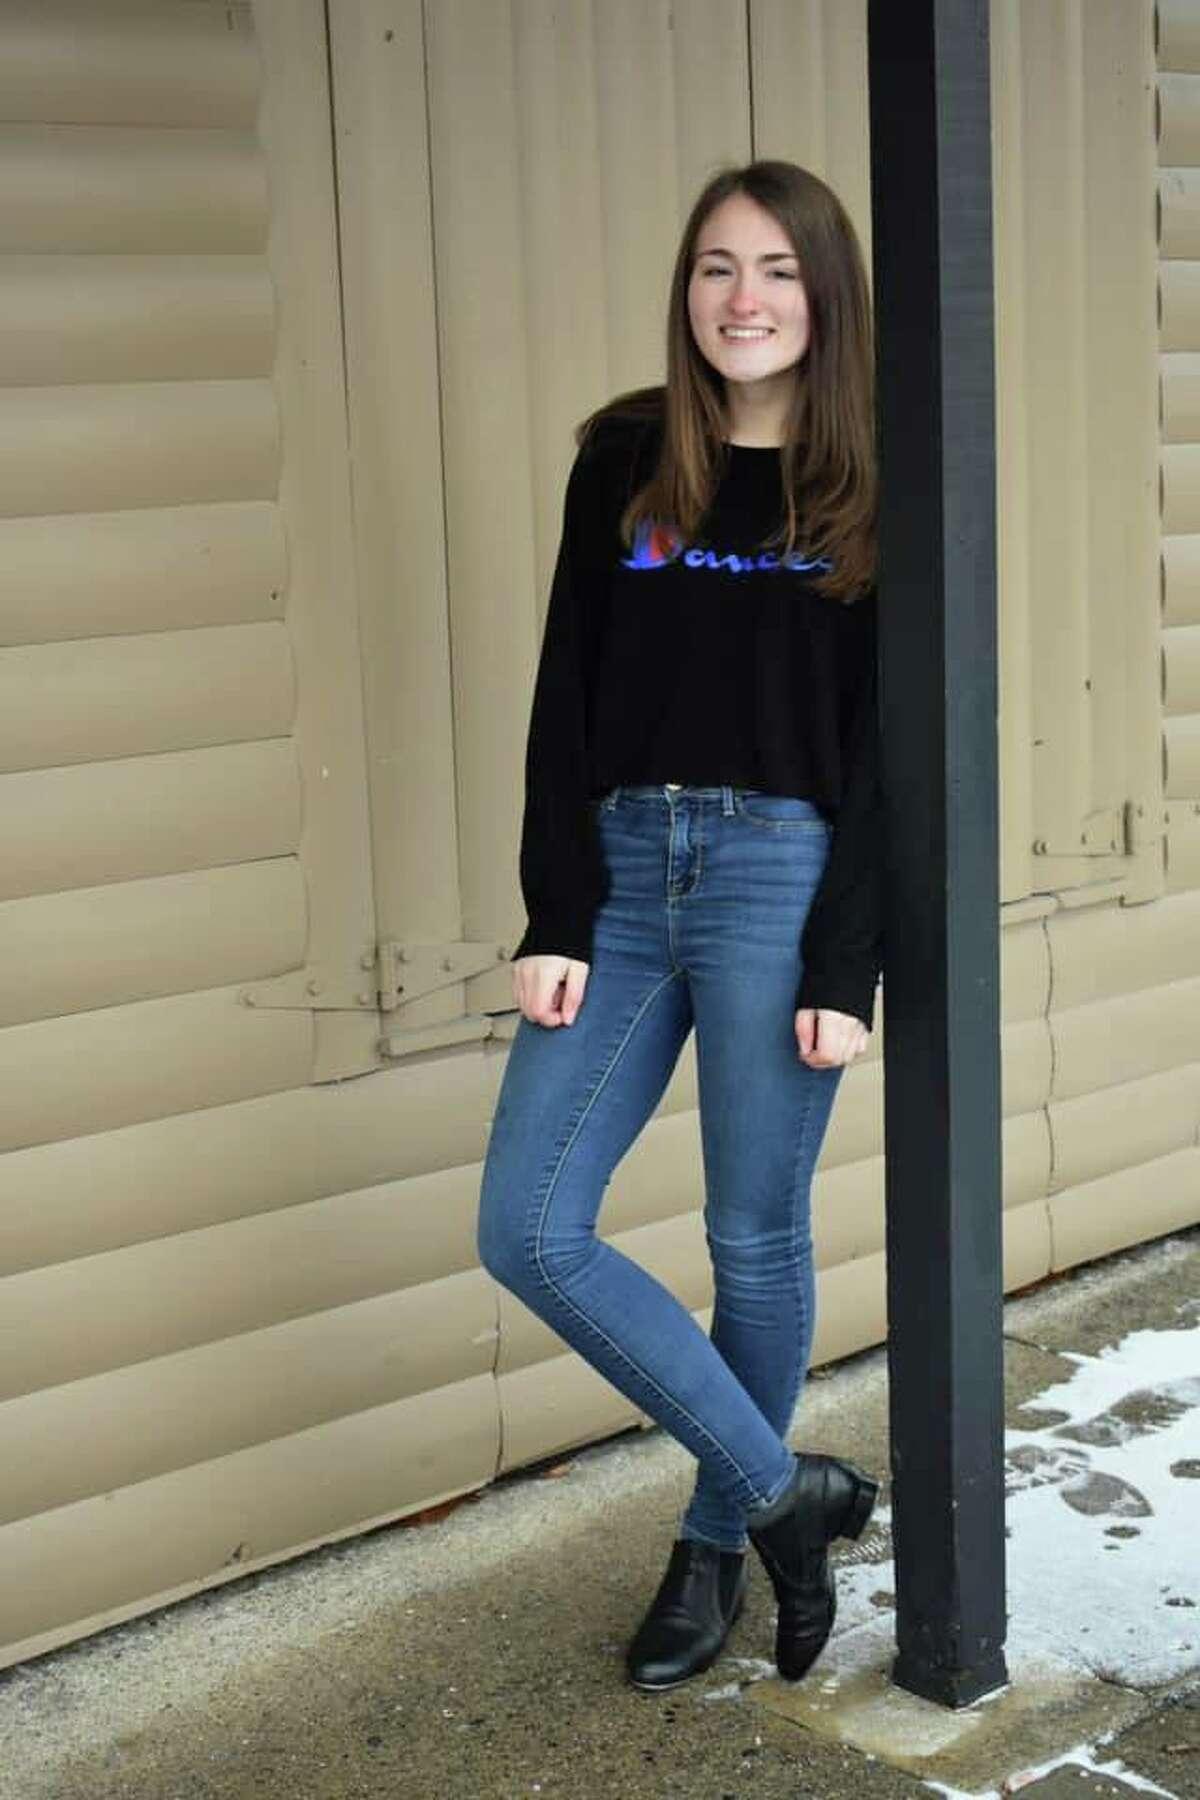 Valerie Sawyer, Big Rapids High School